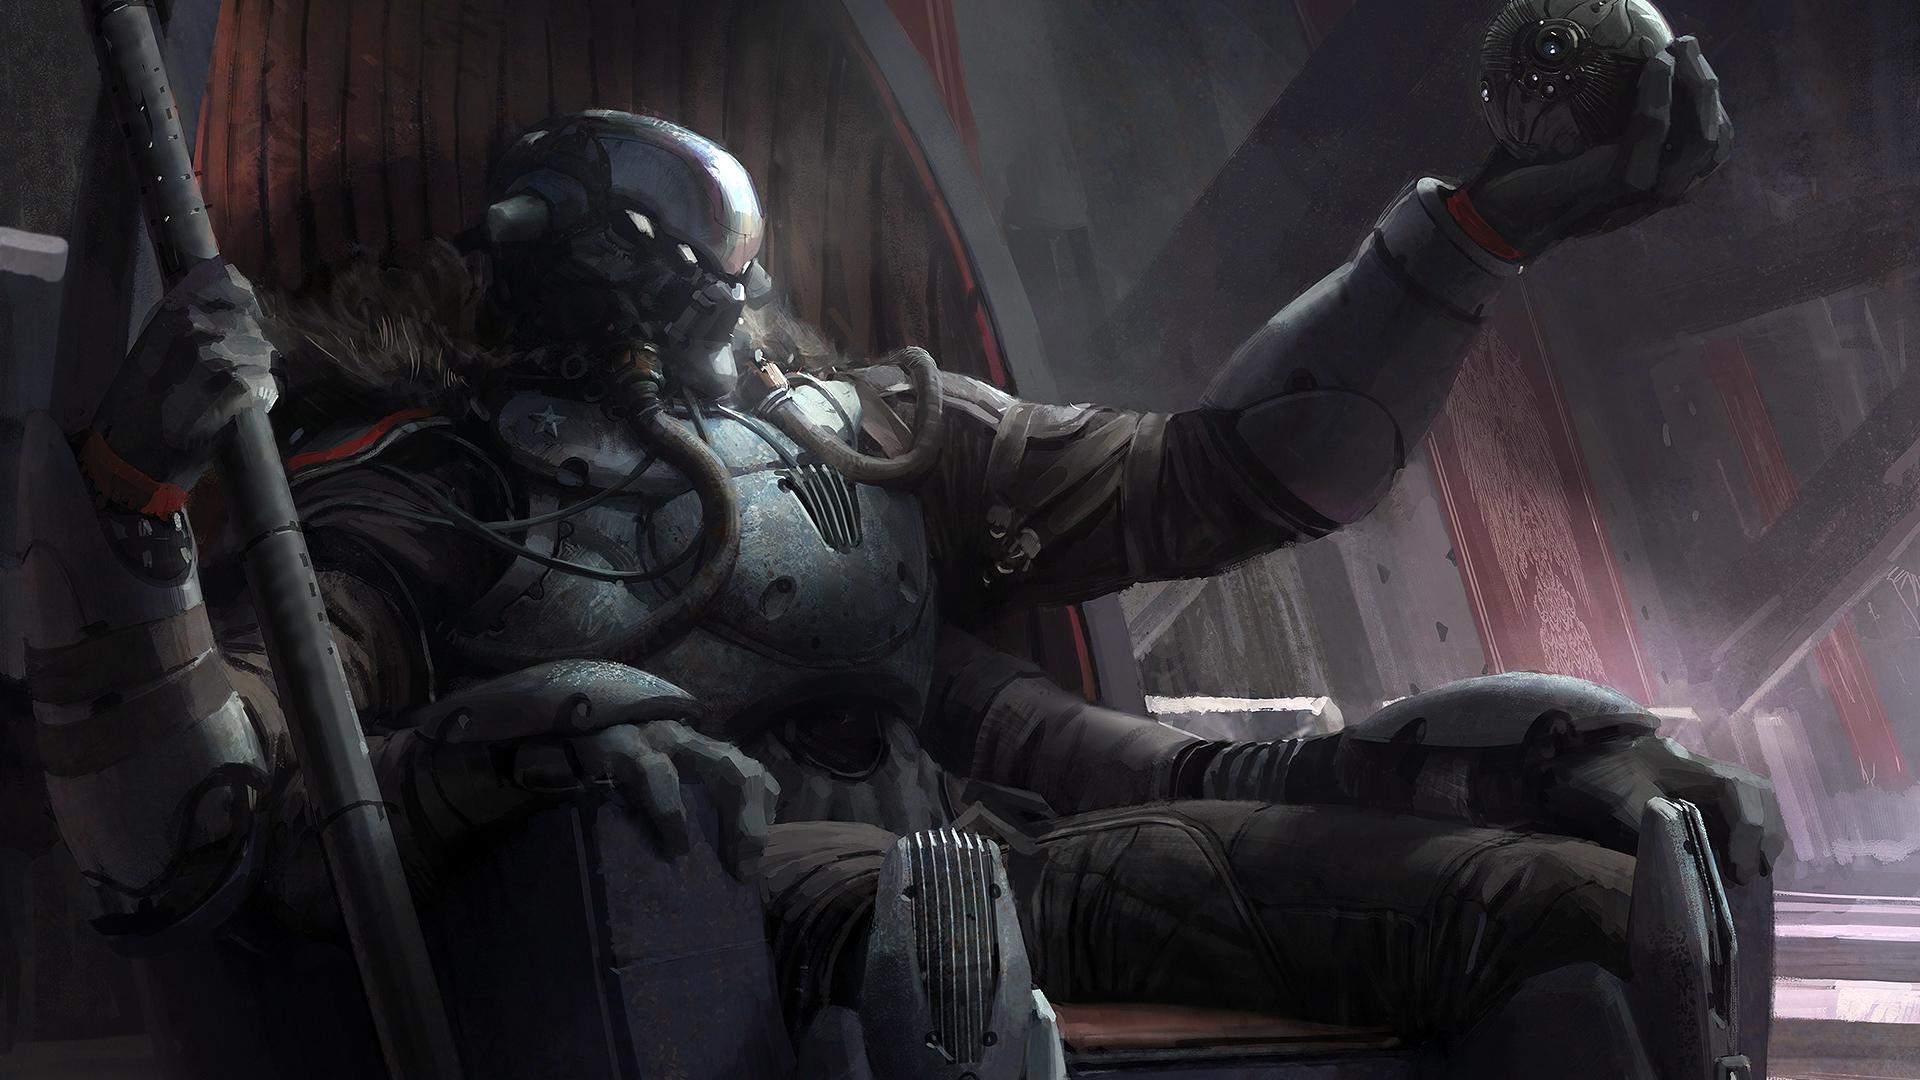 Fallen Captain Destiny game sci fi HD 1920x1080 1080p and compatible 1920x1080